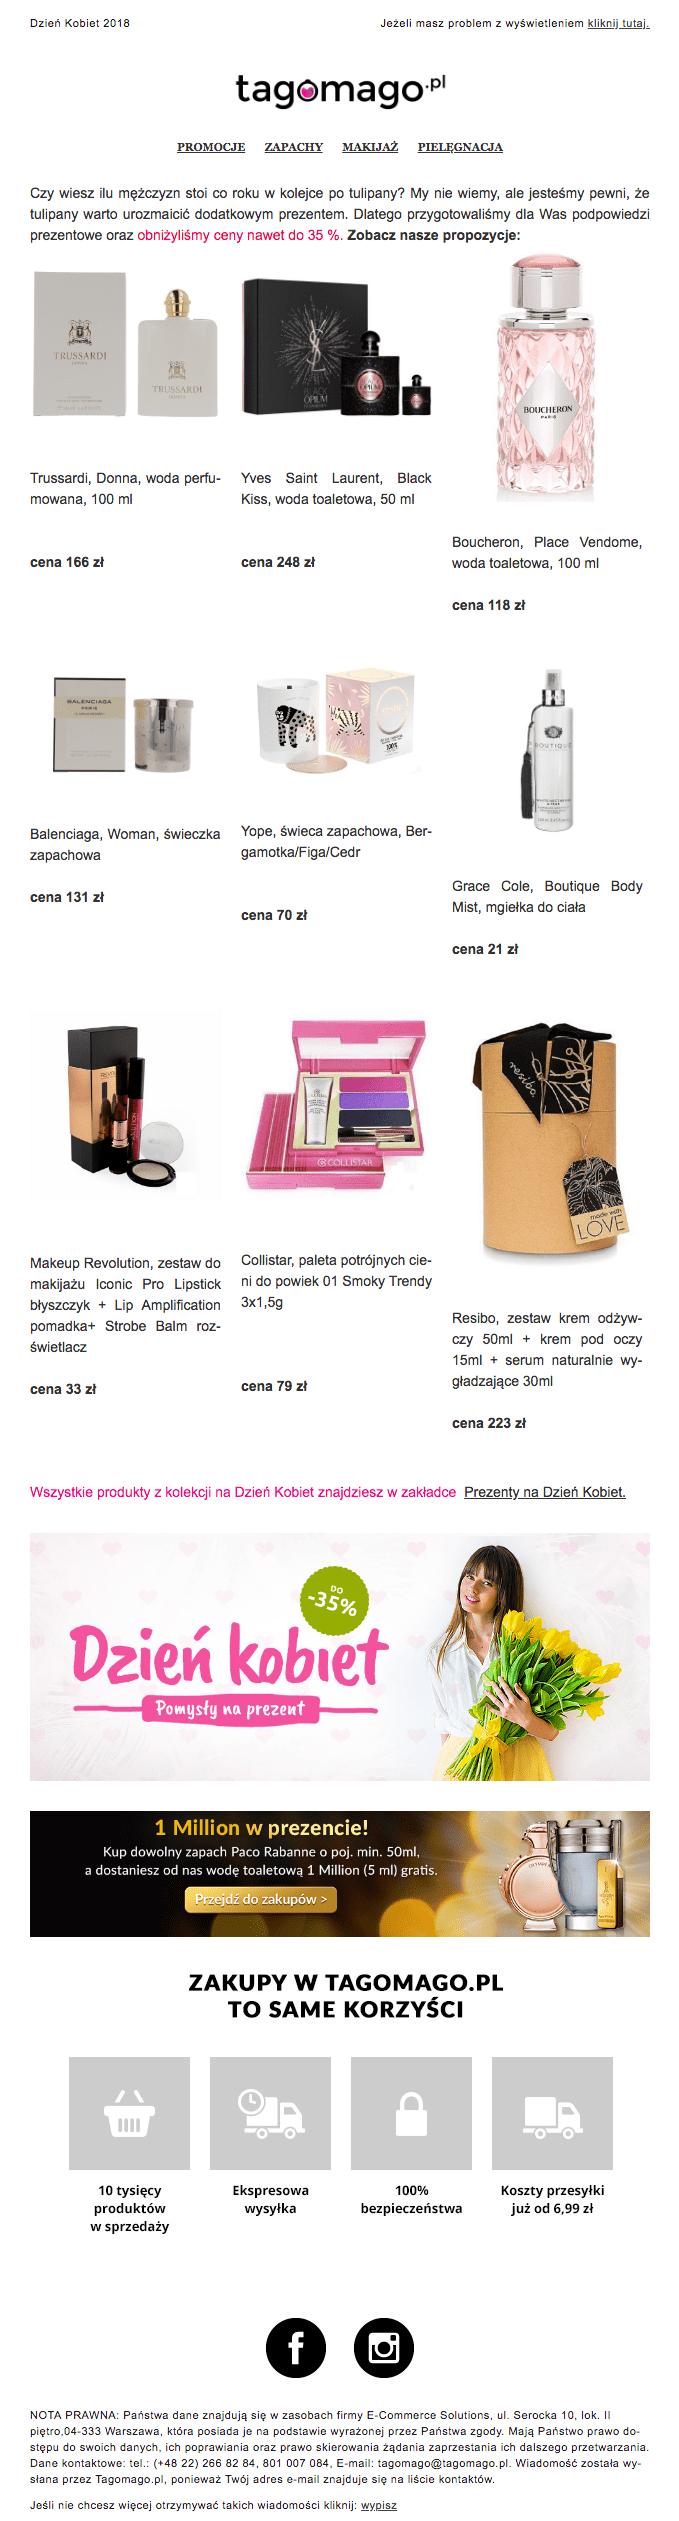 email marketingowe